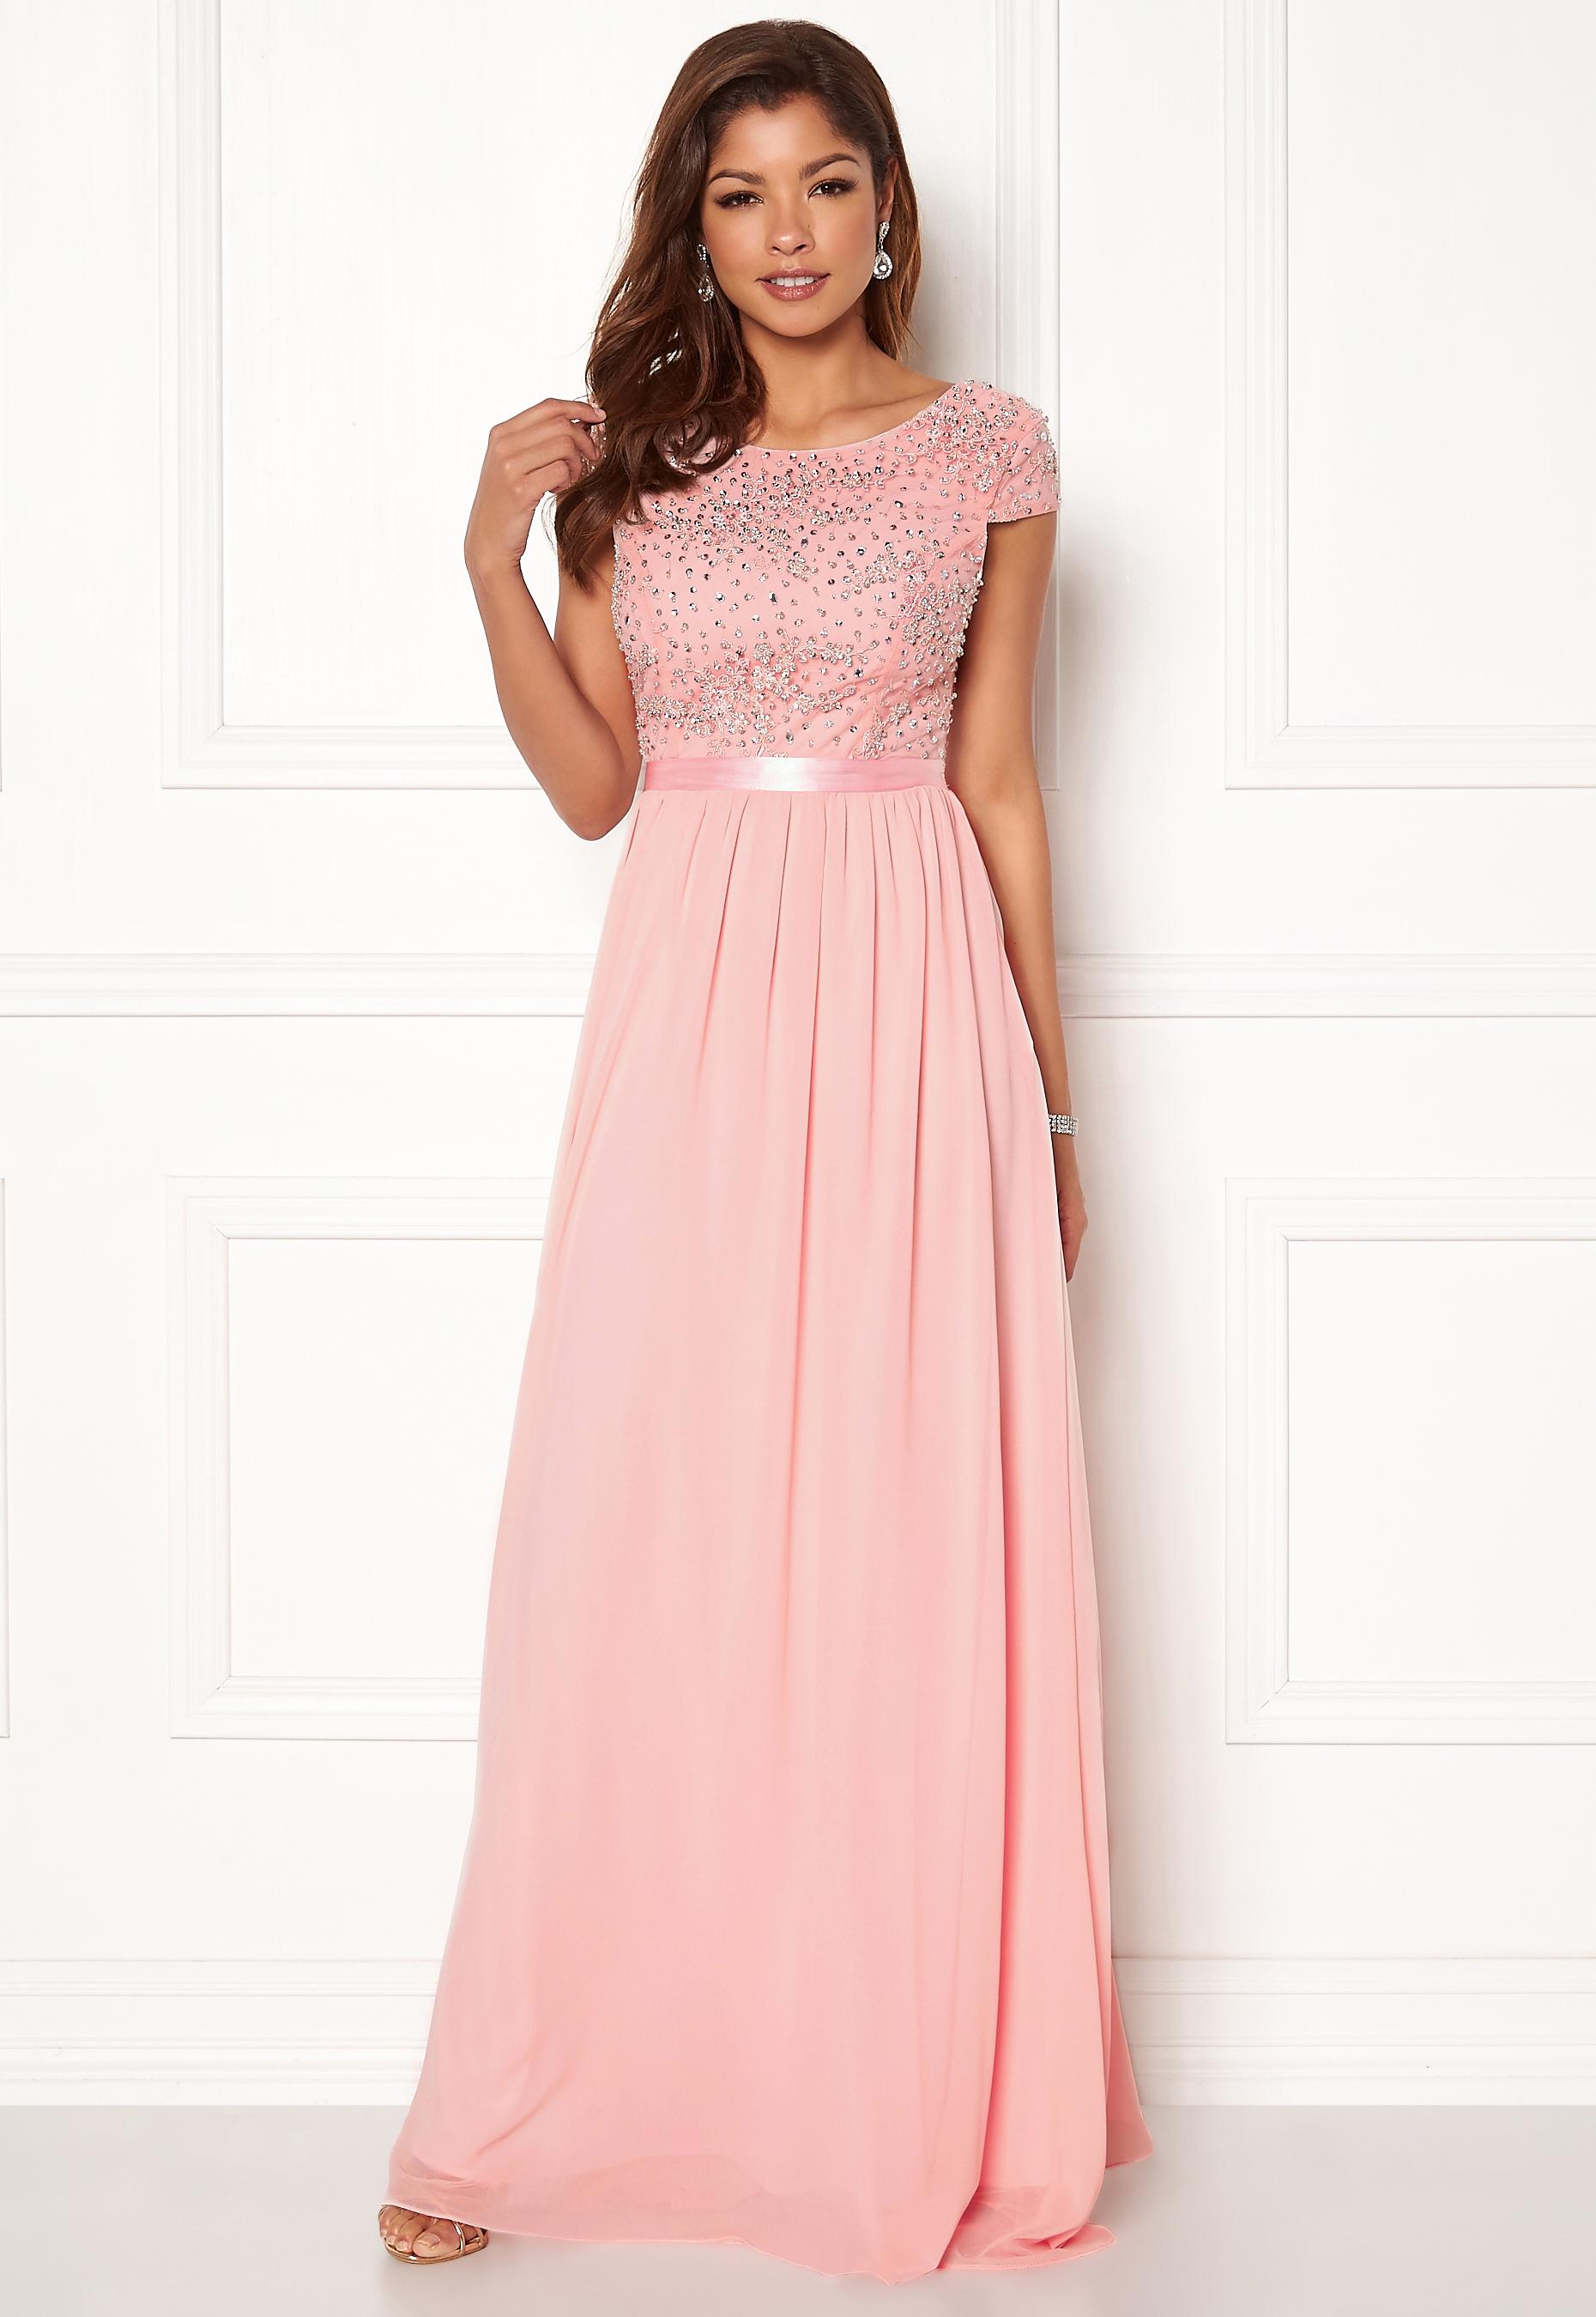 d2a097e98ba9 Chiara Forthi Viviere Sparkling Gown Pink - Bubbleroom